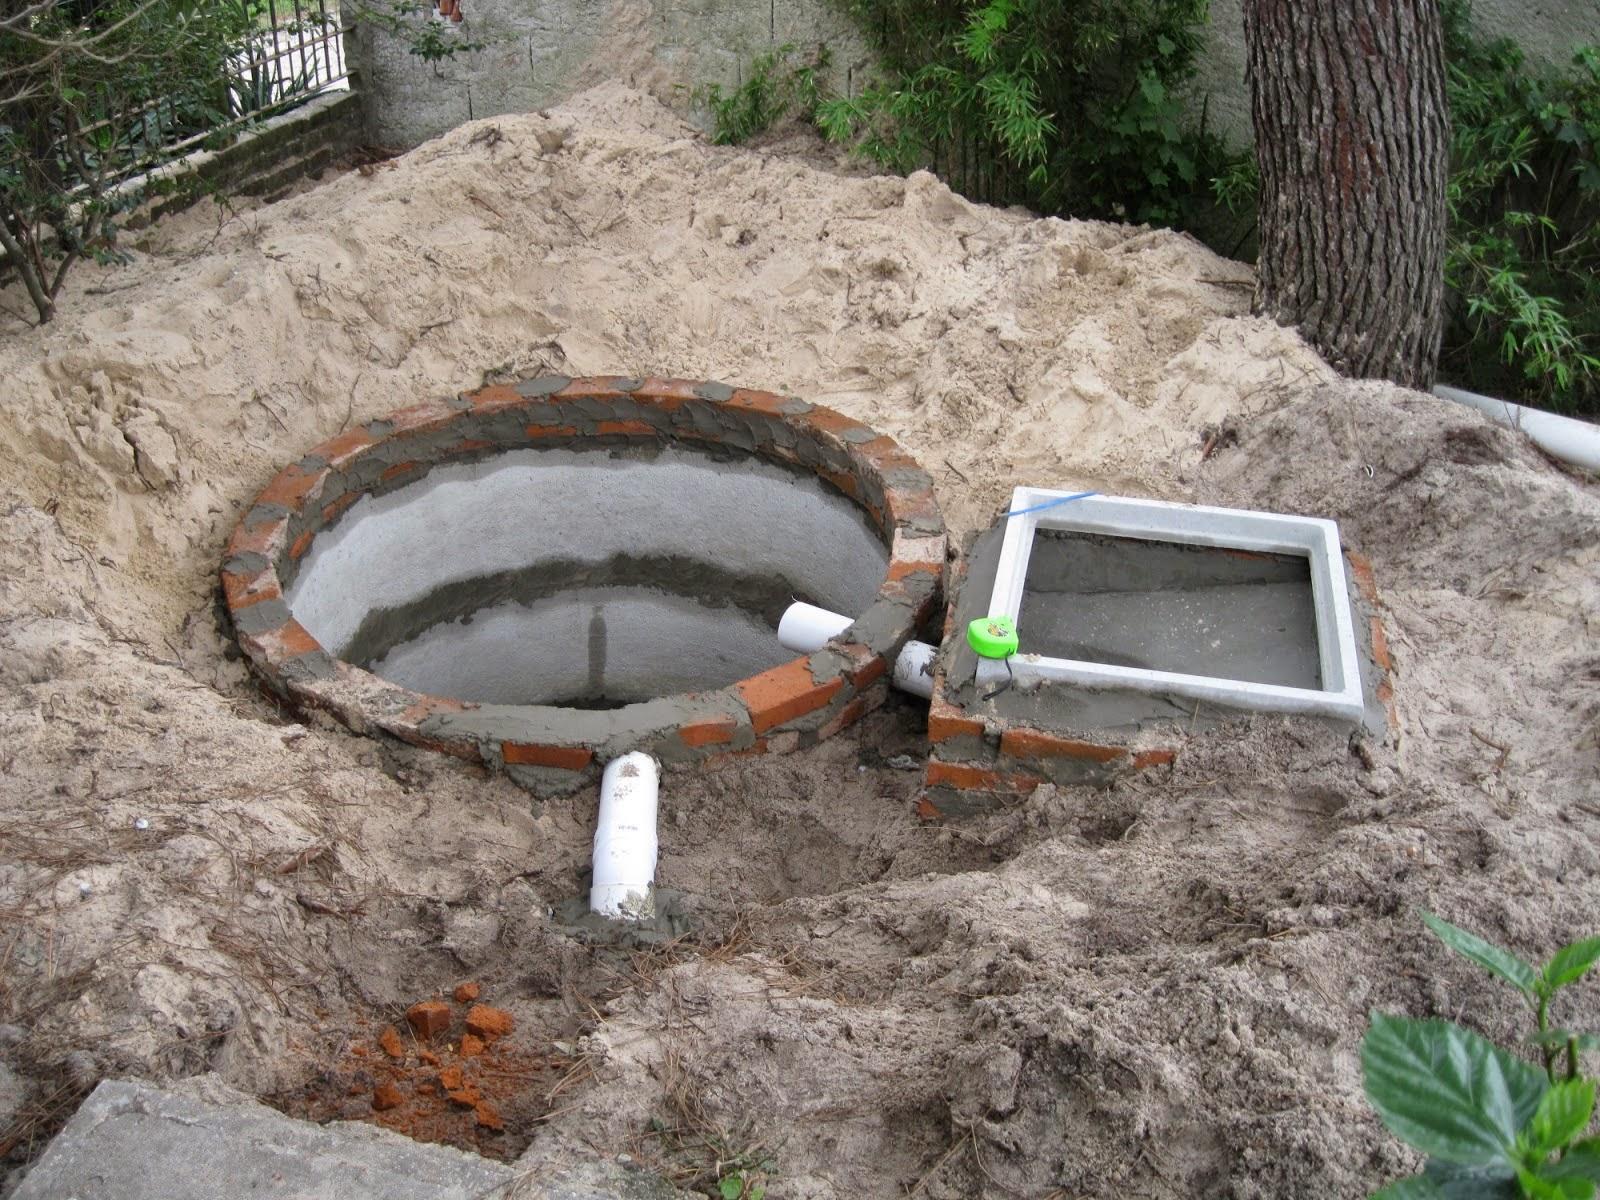 Desatascos sevilla fosas septicas resulima 955 265 389 for Fosa septica sodimac